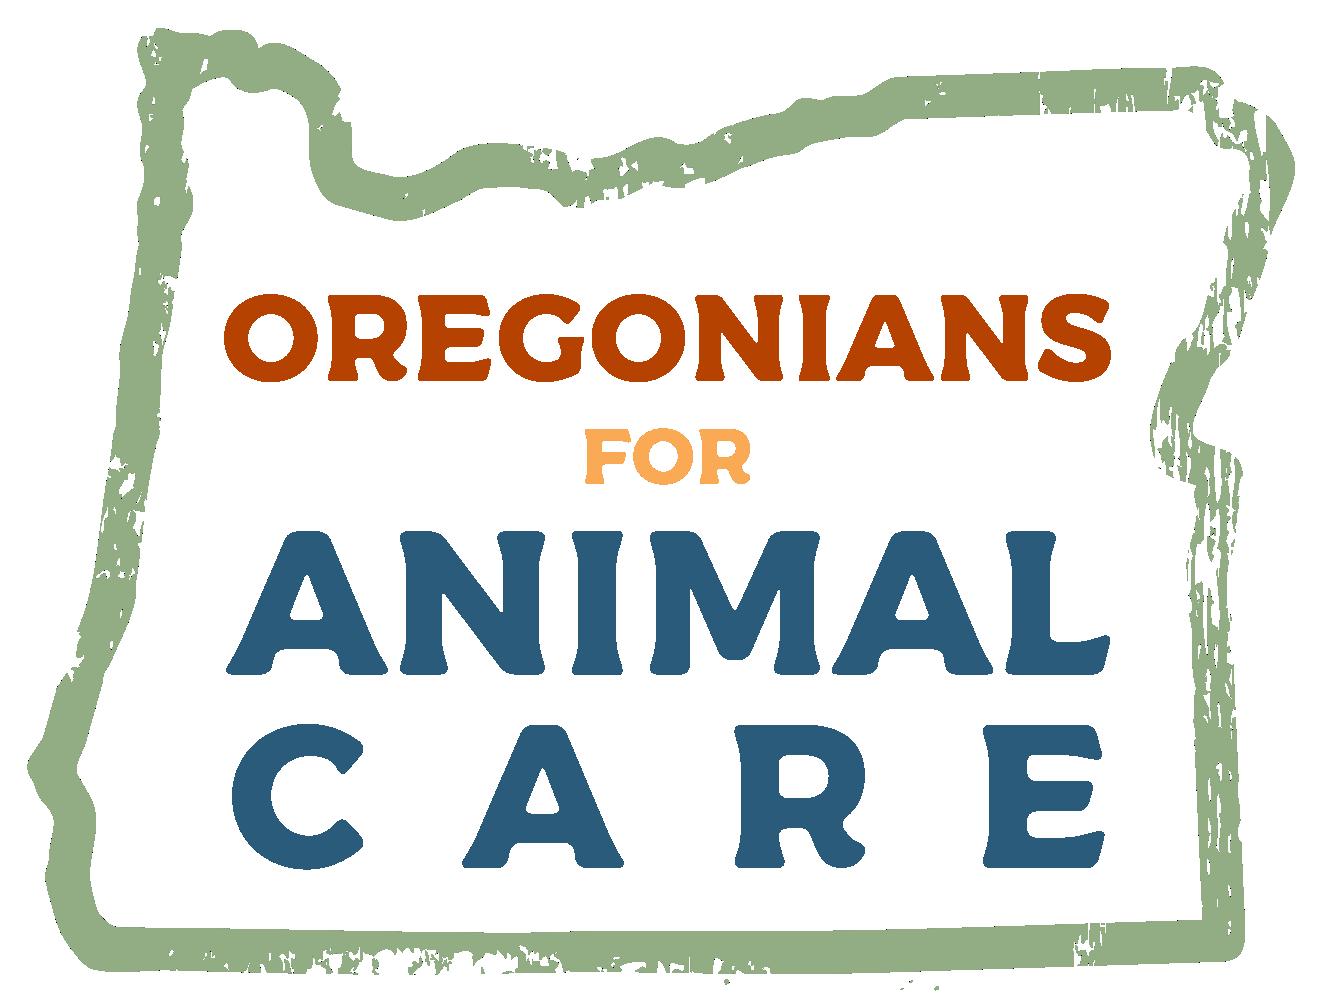 Oregonians for Animal Care